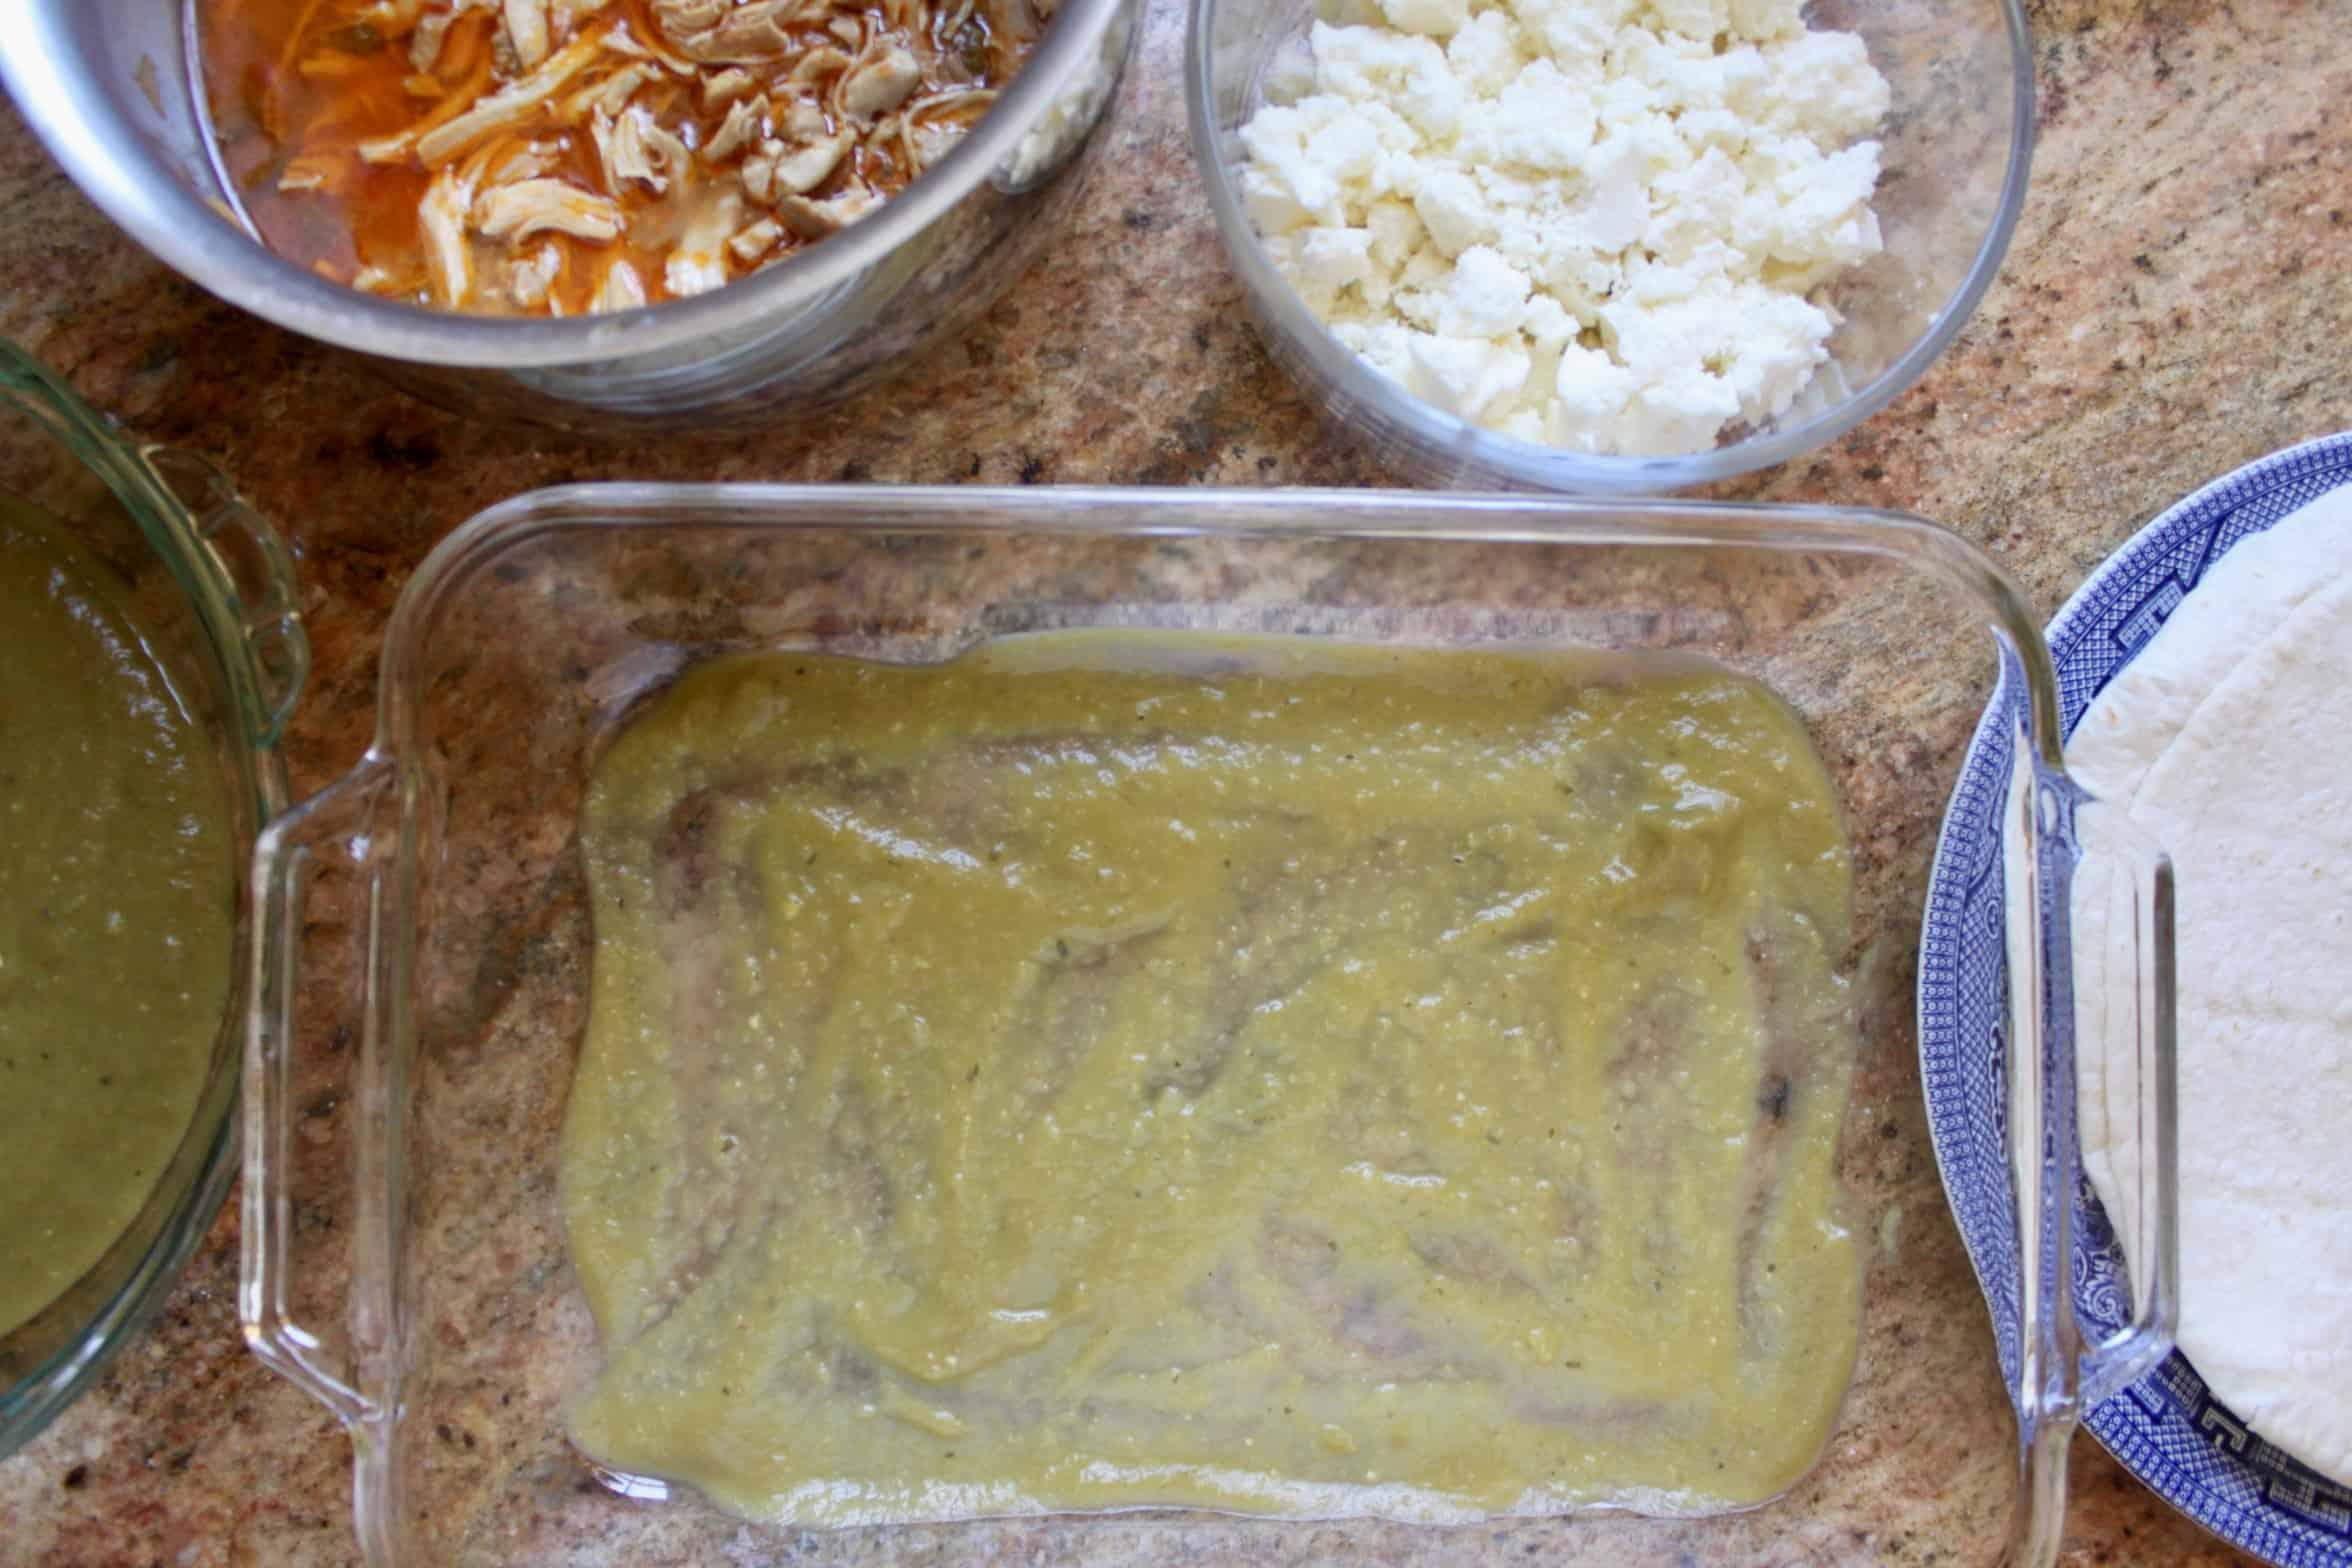 enchilada making station